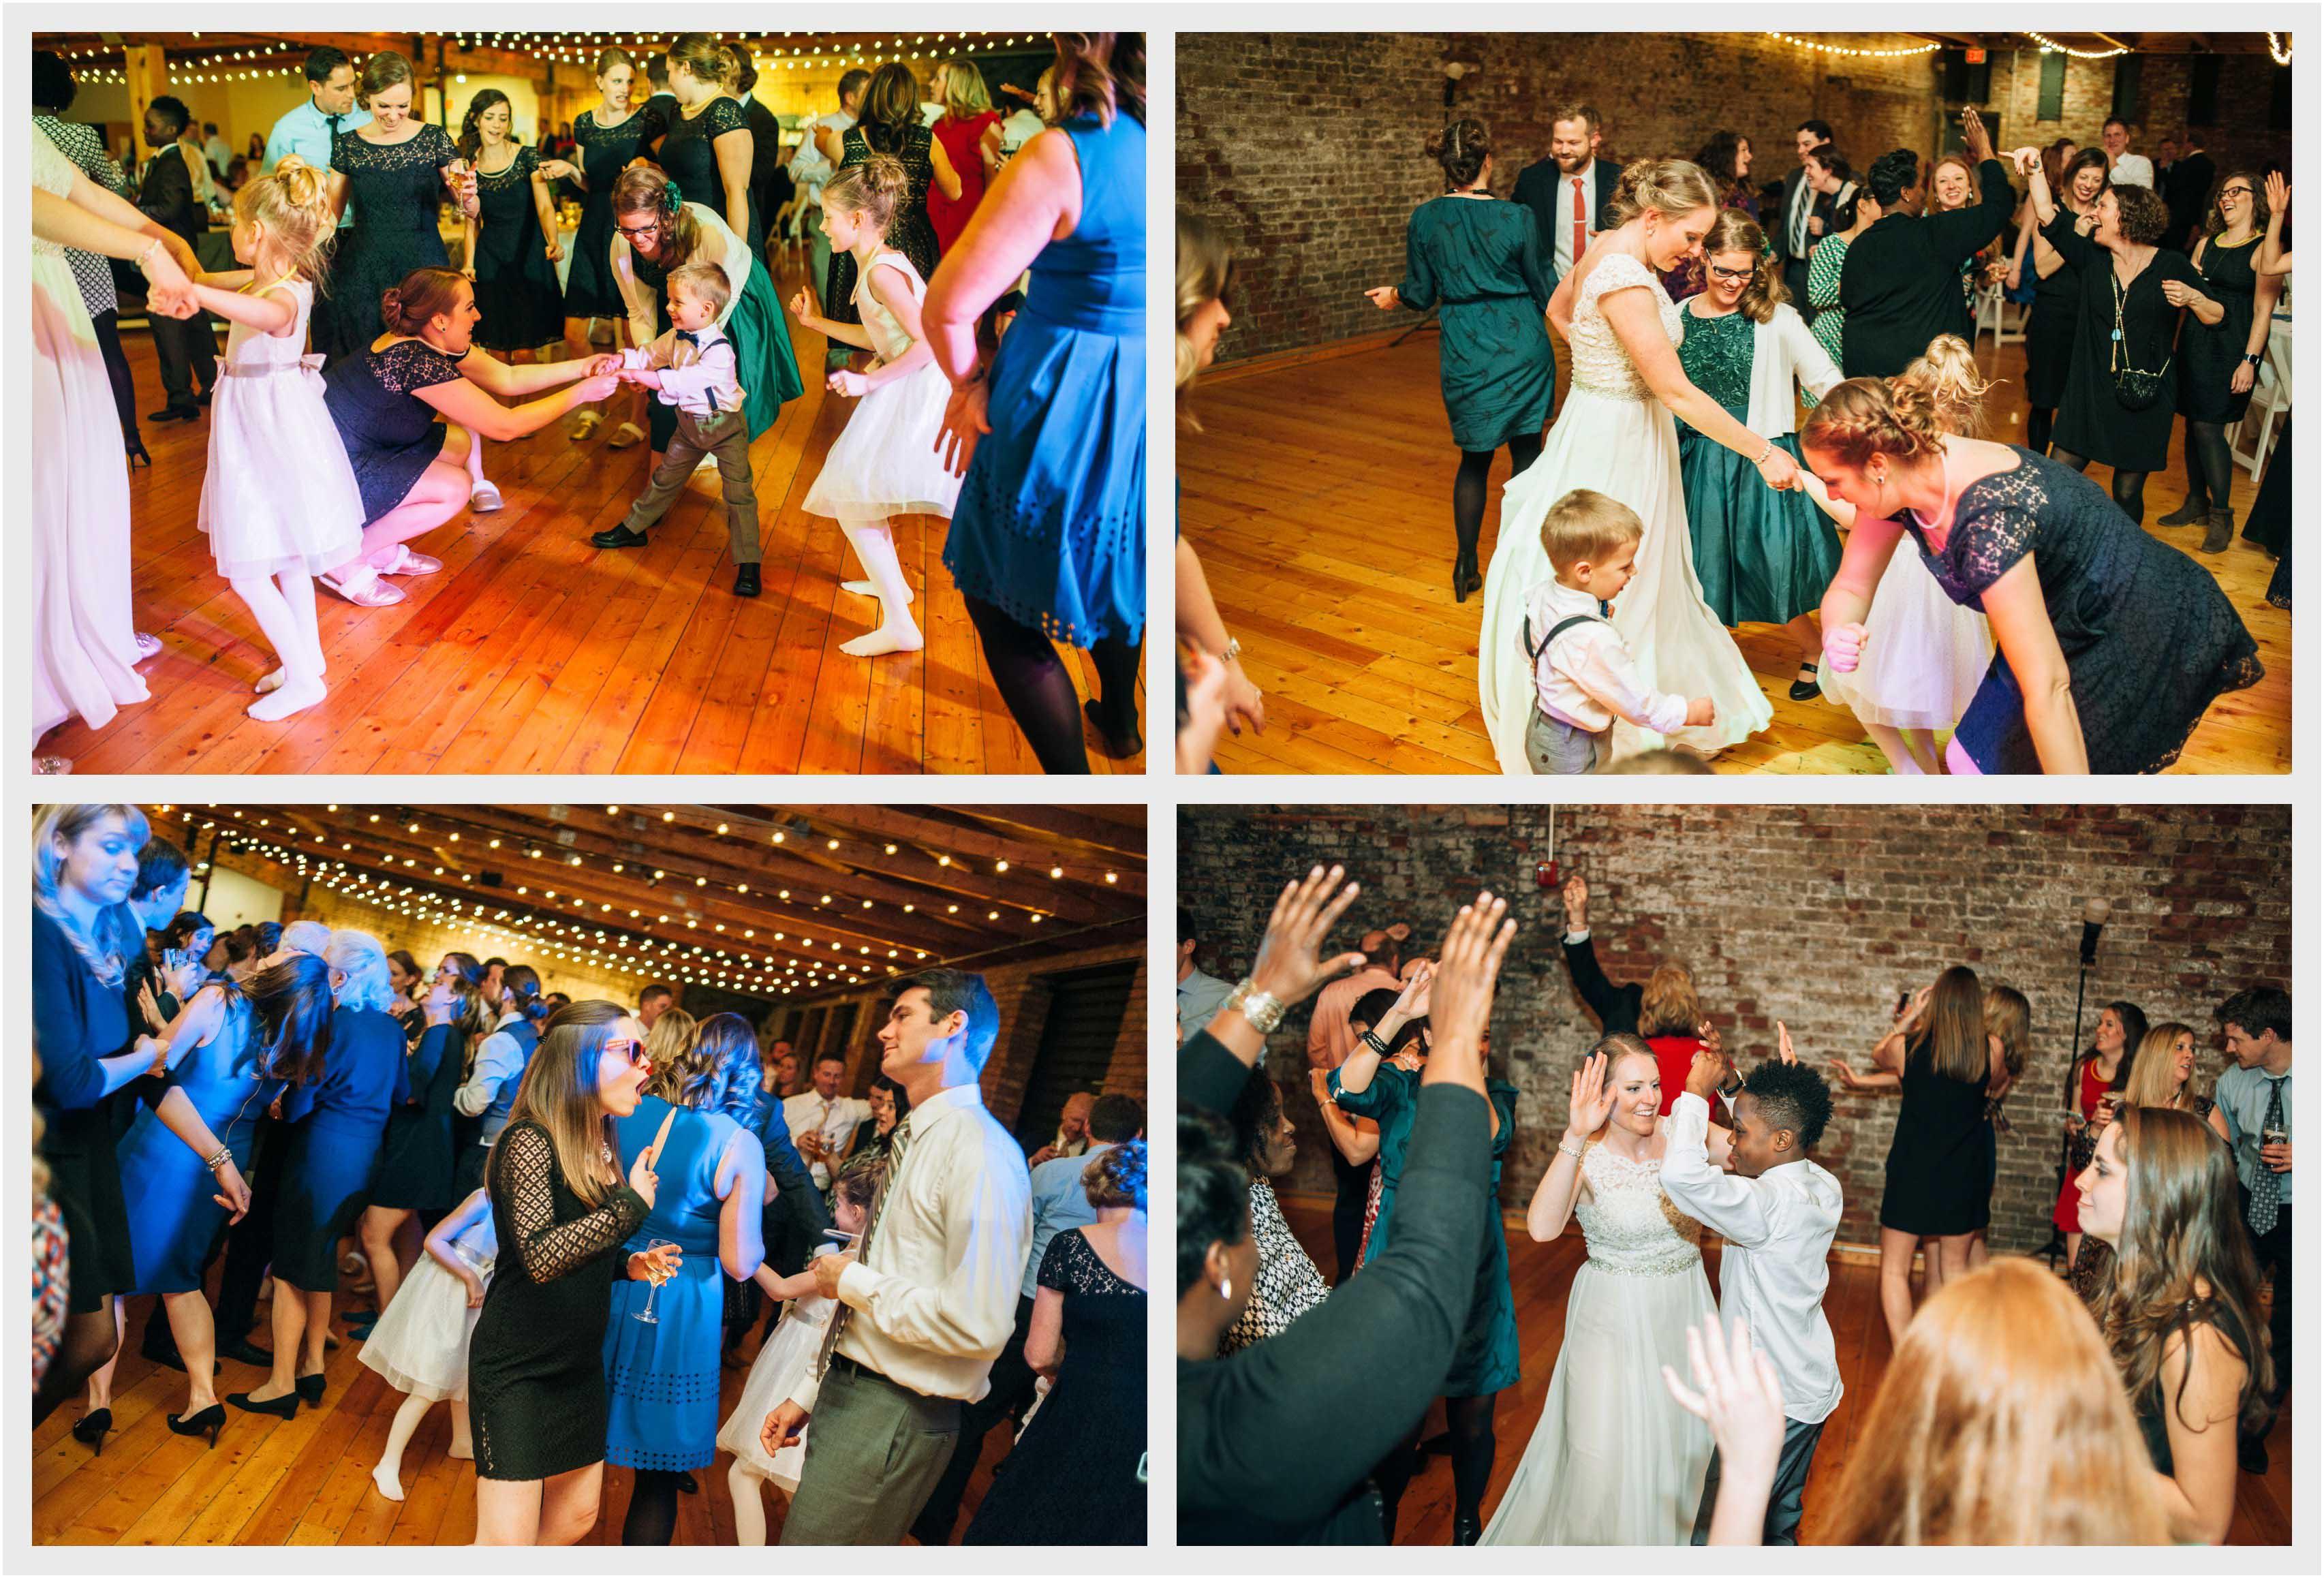 Rhinegeist wedding photos 31